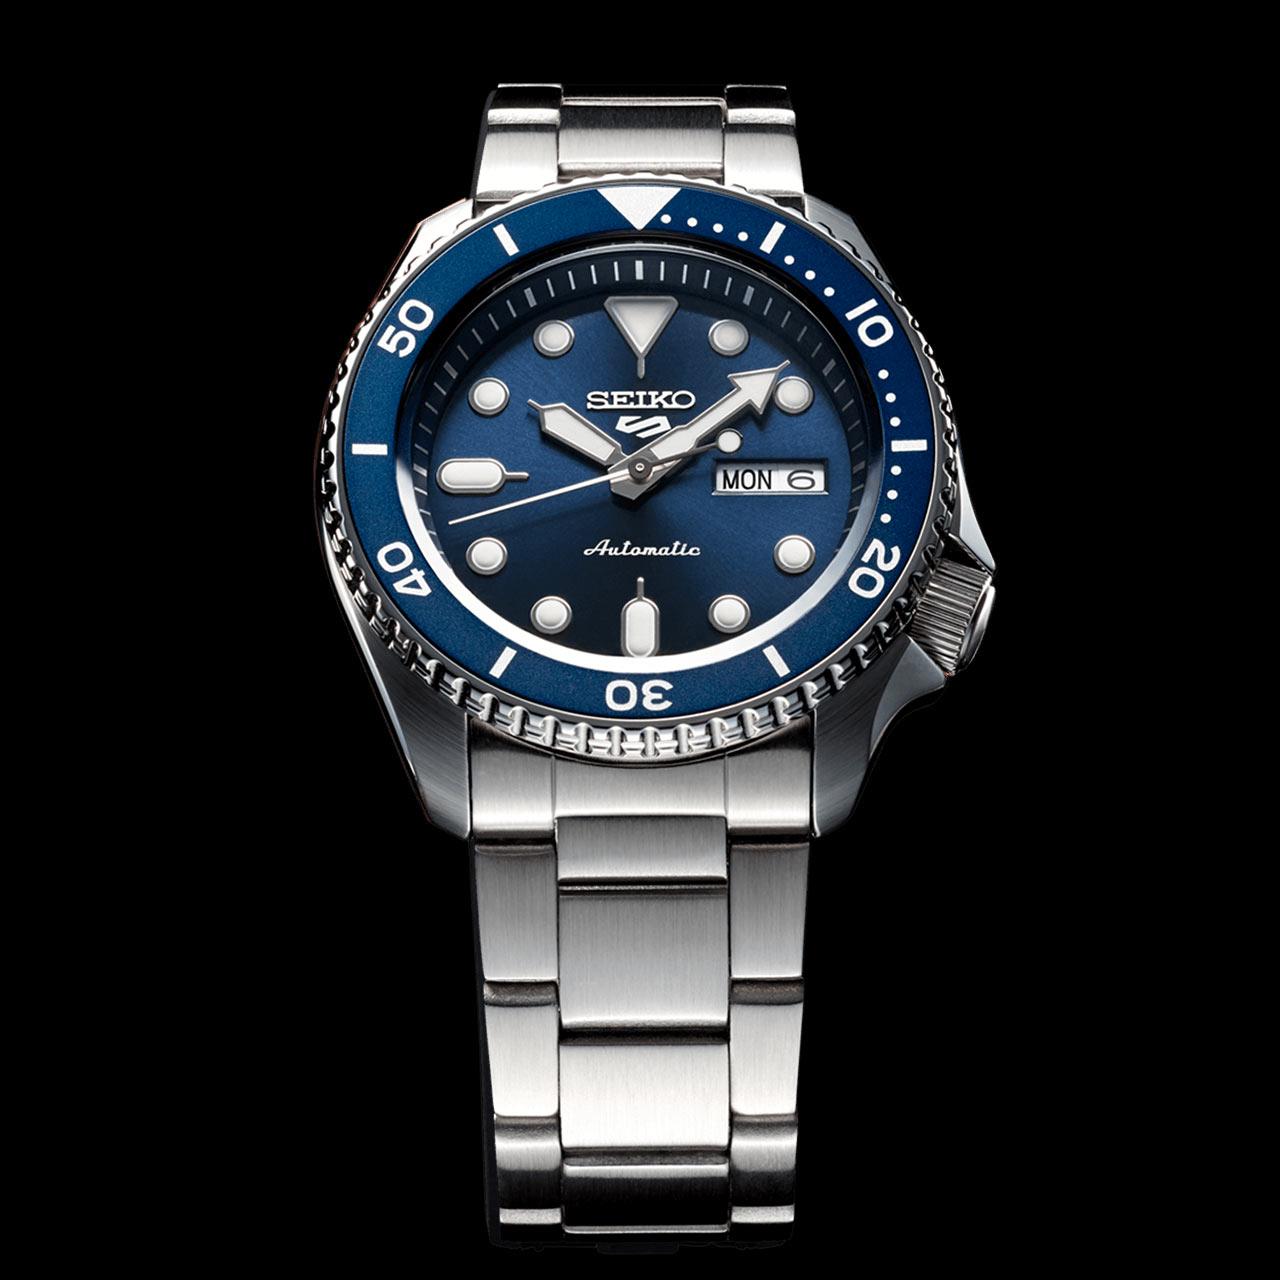 Seiko - New Seiko 5 Sports Collection   Time and Watches ...